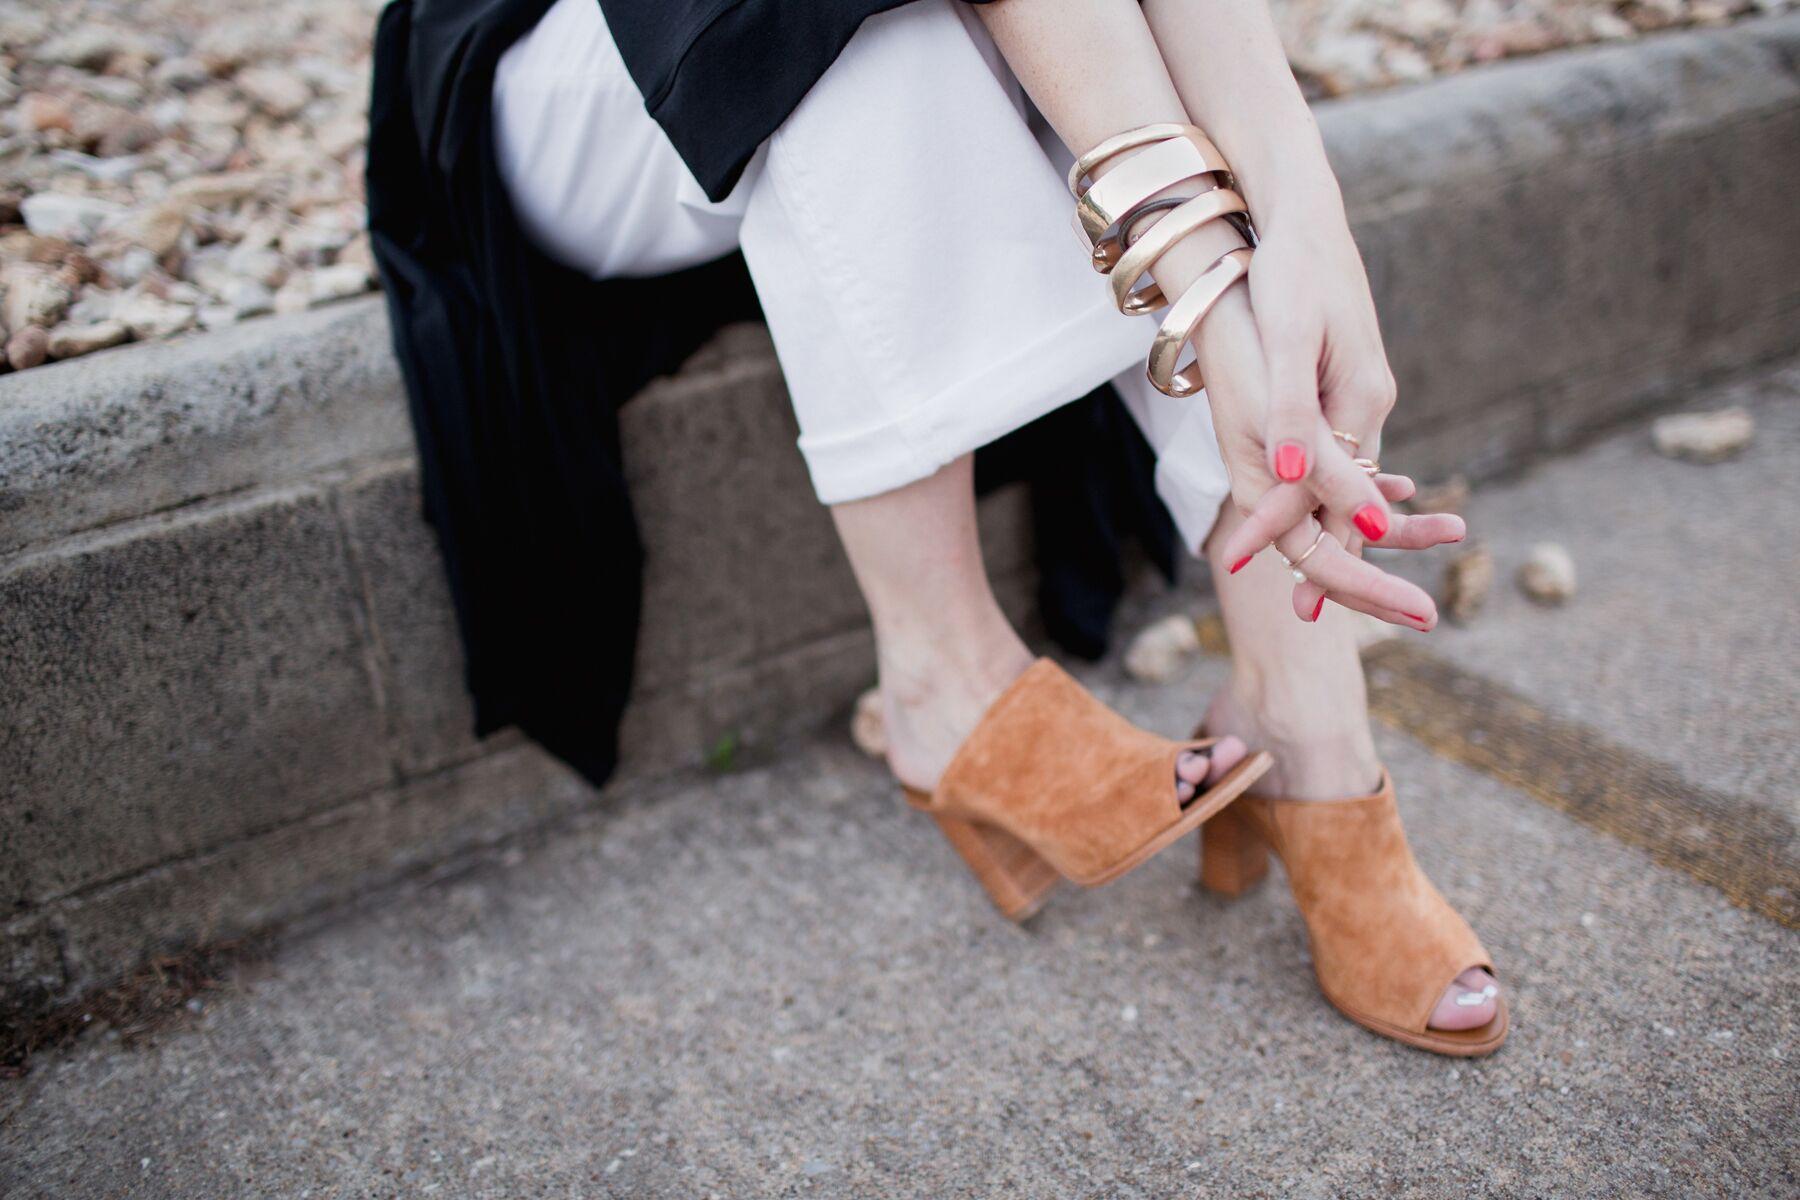 eldridge_edit_anna_e_cottrell_fashion_blogger_black_and_white_shop_lola_boutique_mgb_photo_mother_white_jean_b_low_the_belt_dita_freebird_sunglasses_joie_cognac_mules_vintage_bracelets_5.JPG